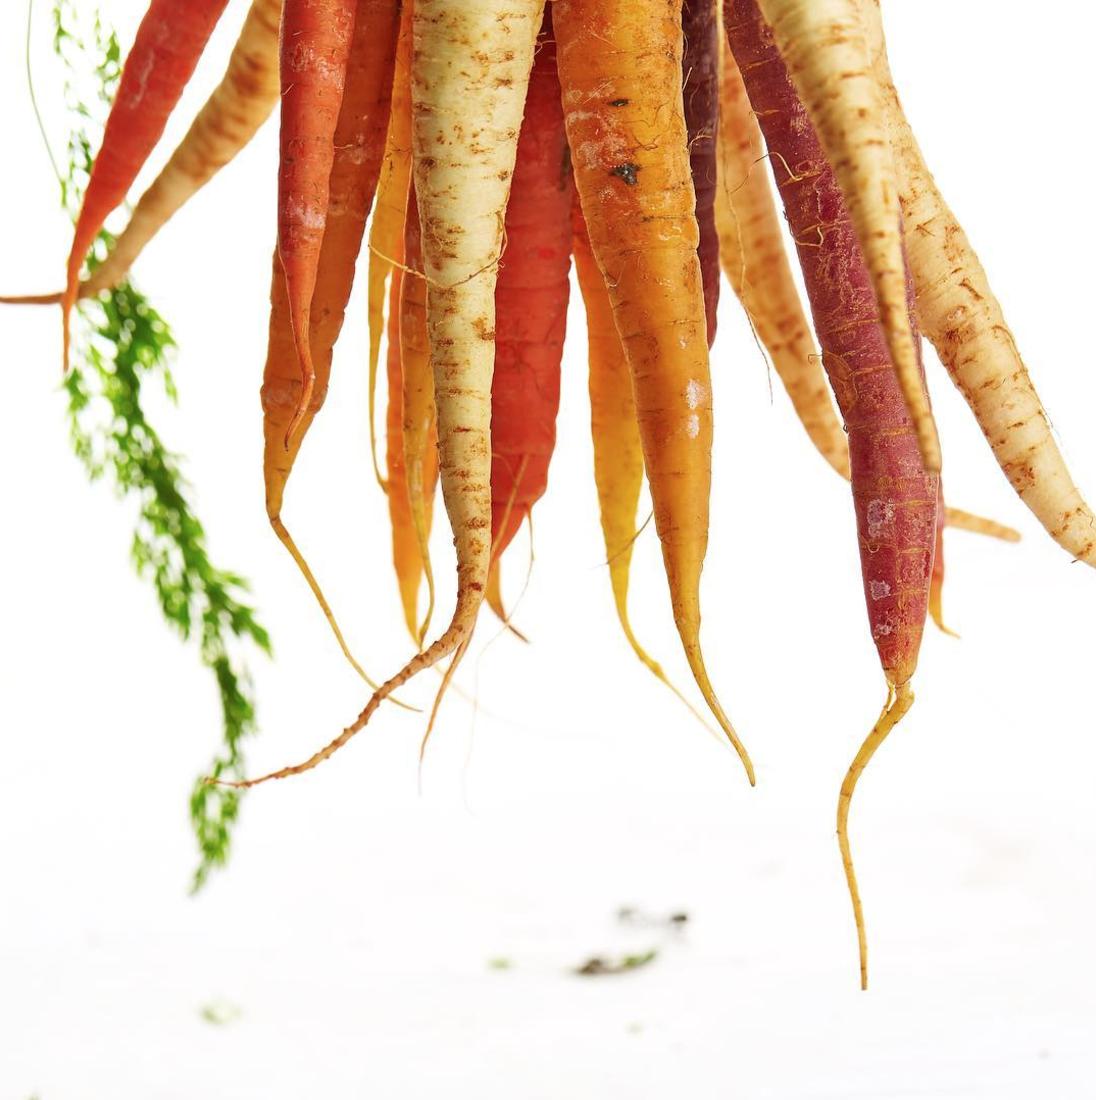 tonic-juicery-carrots